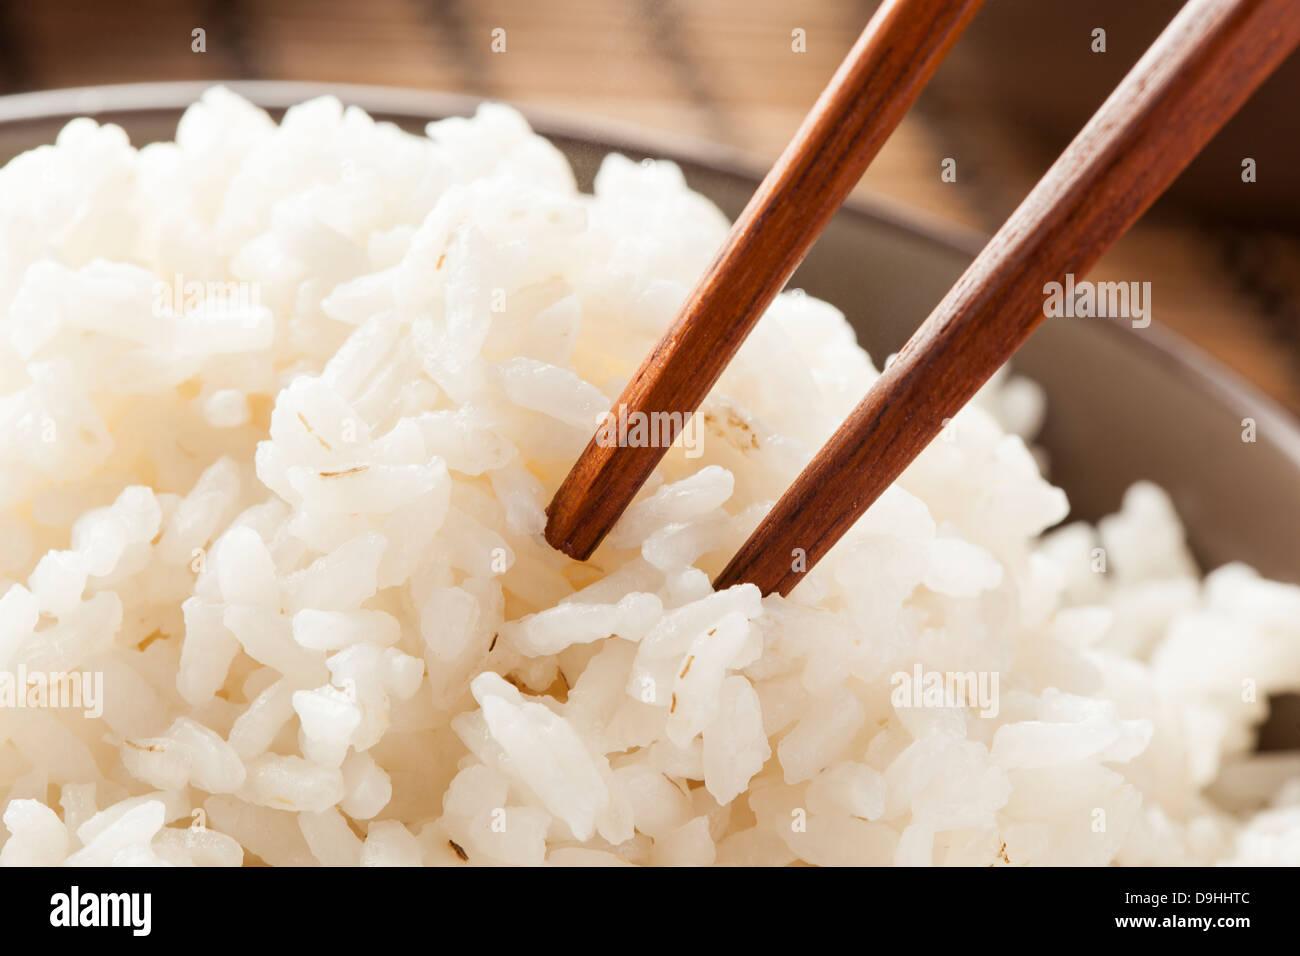 Bowl of Organic White Rice with chop sticks - Stock Image